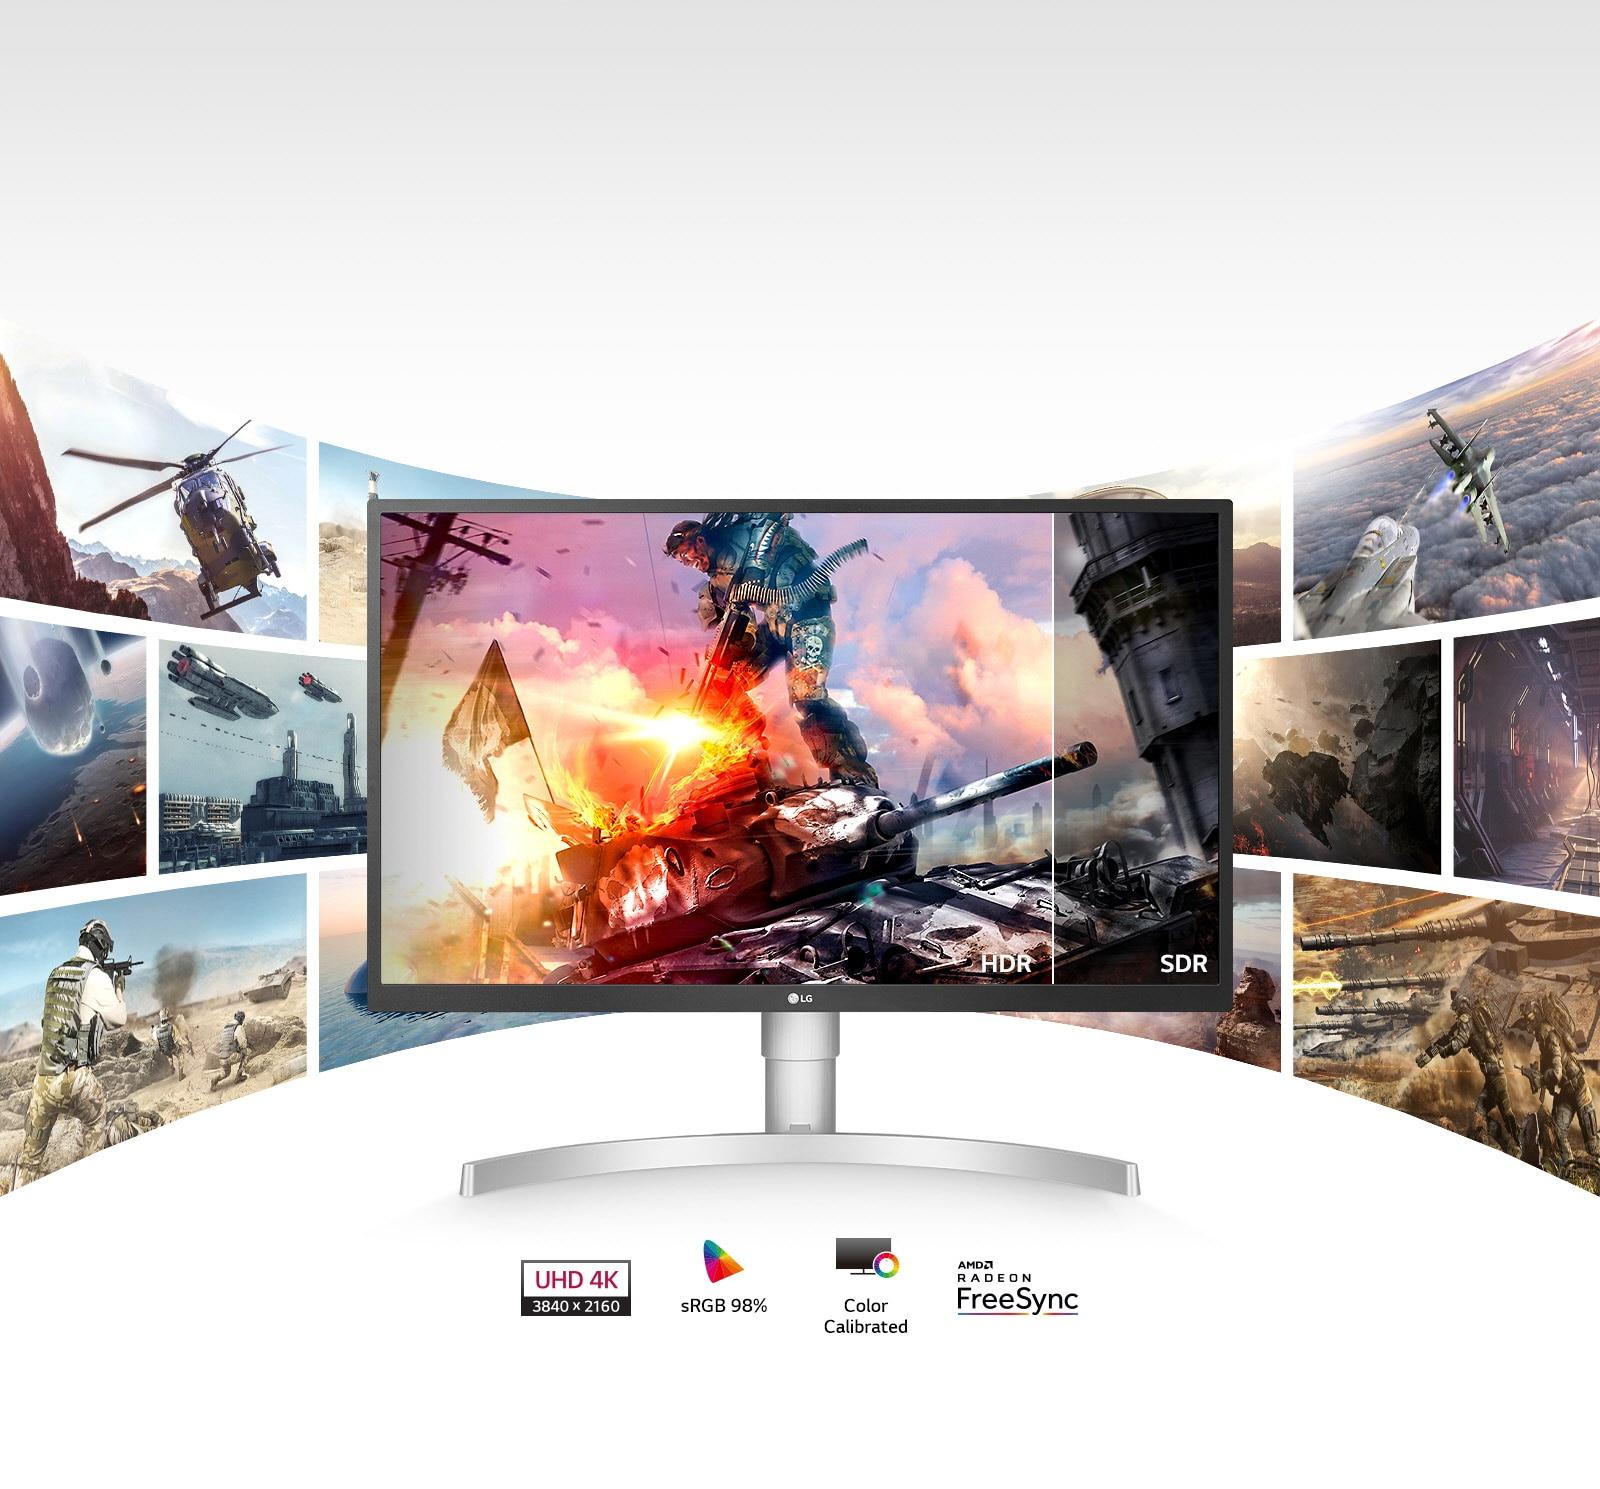 Upoznajte UHD 4K HDR monitor1